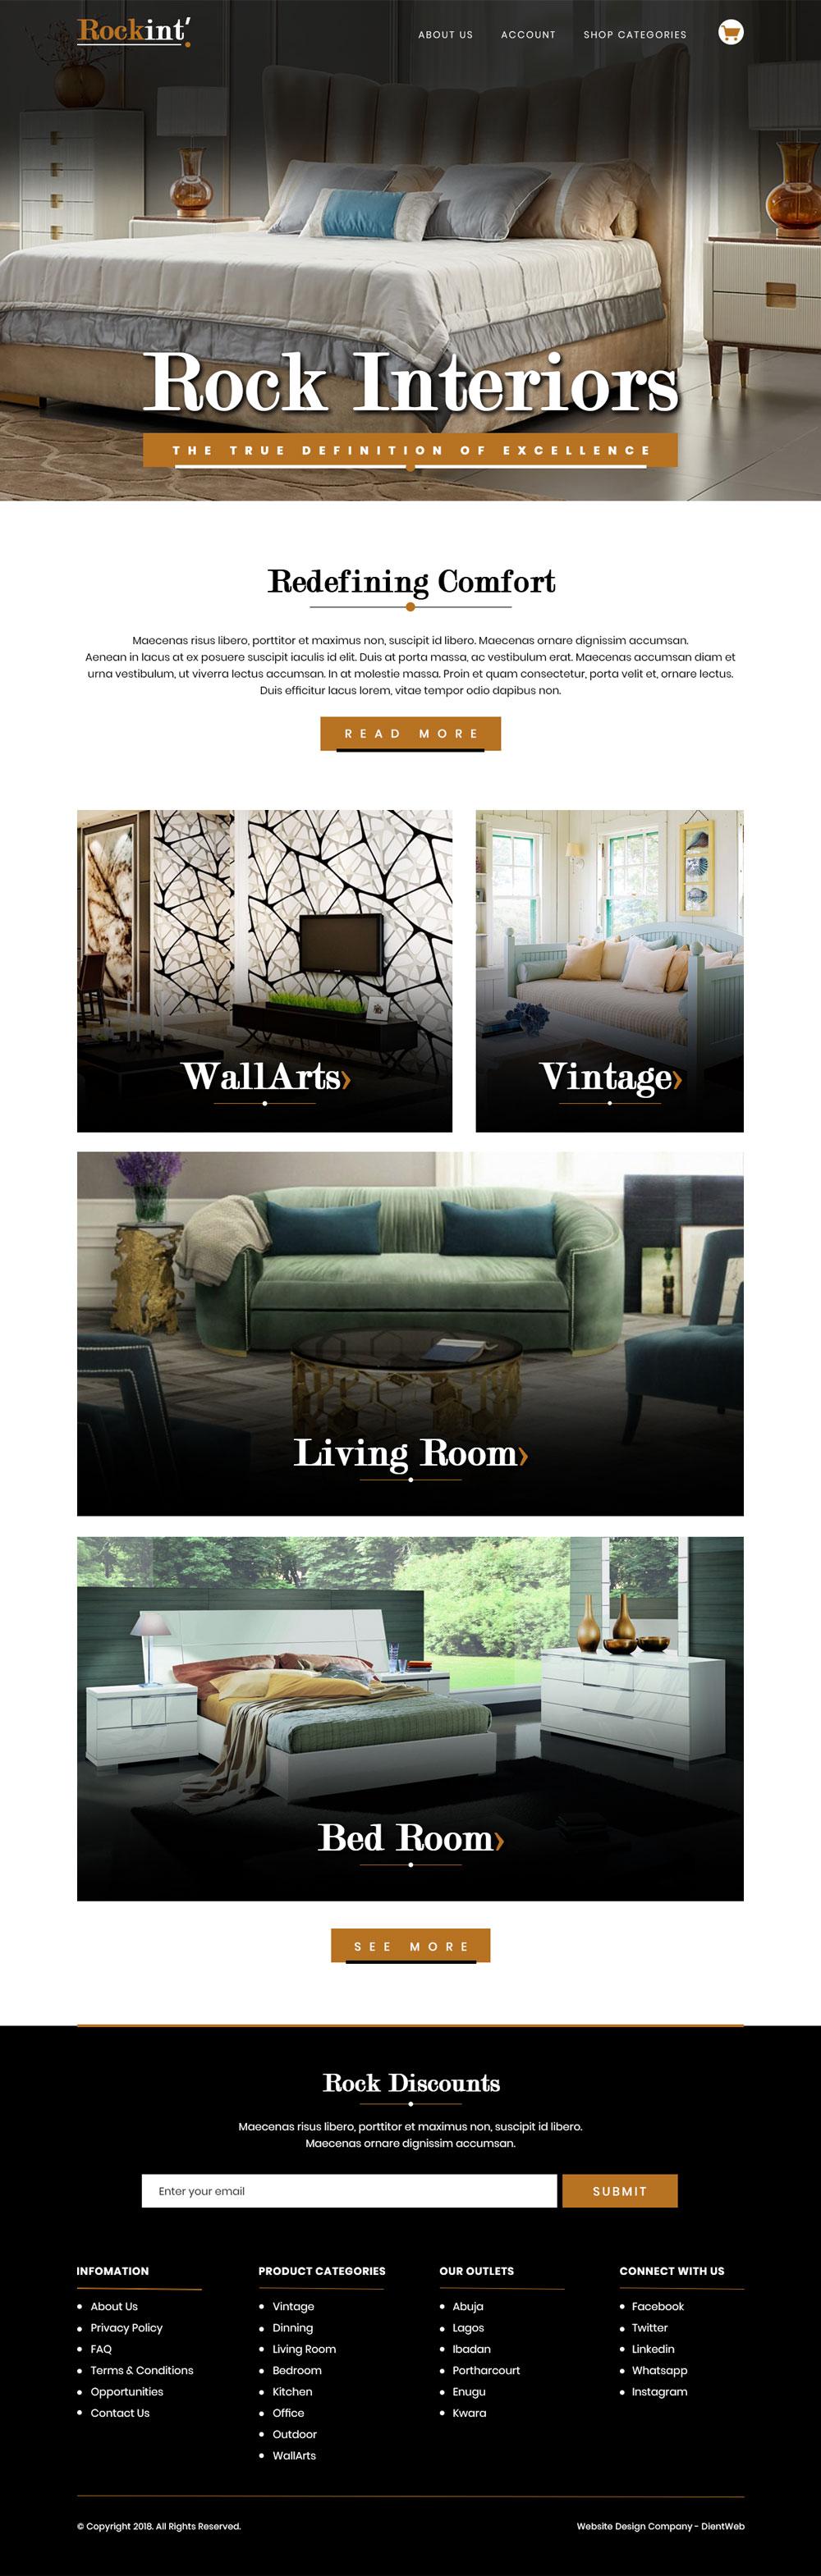 ecommerce website design for rock interiors